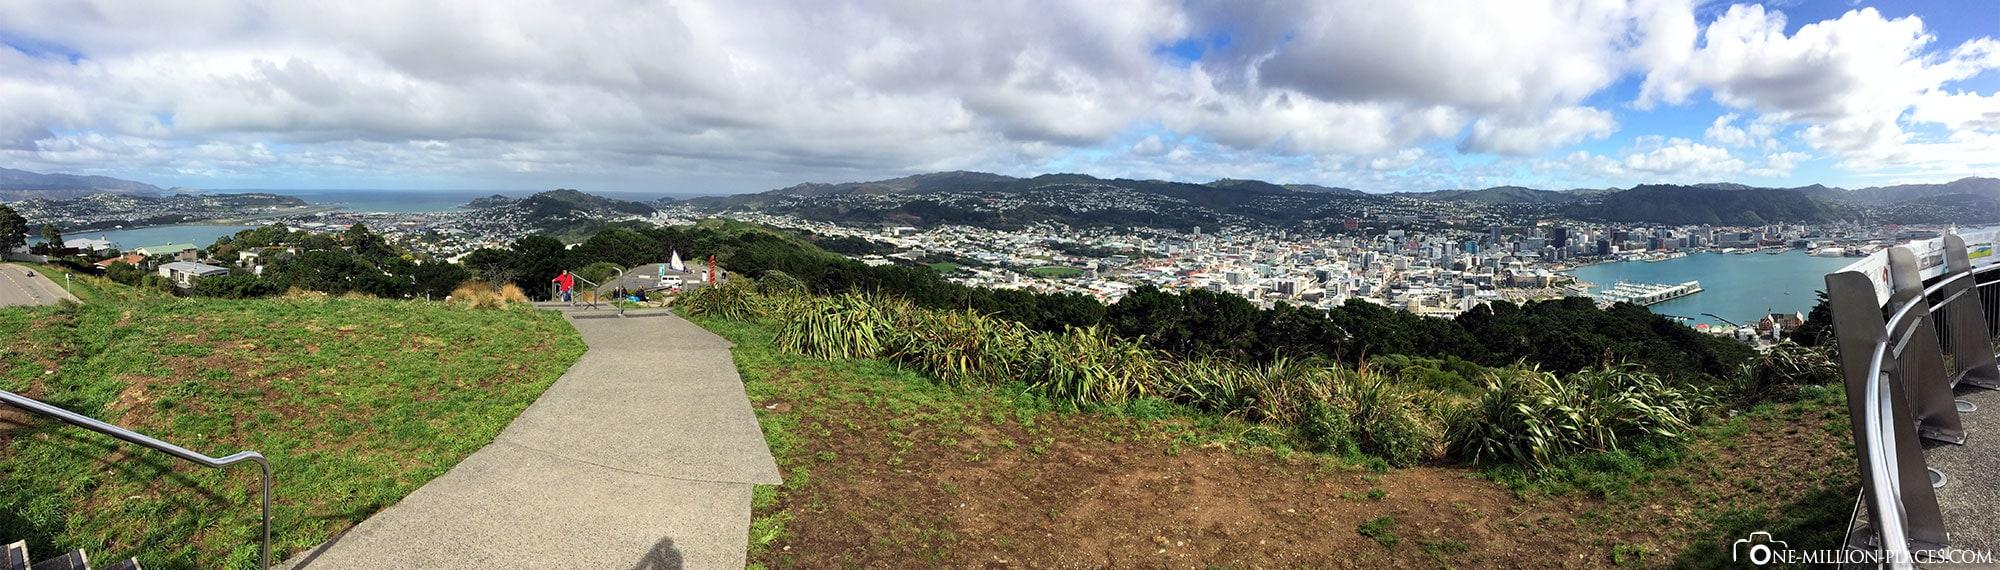 Wellington, Mount Victoria, Neuseeland, Nordinsel, Auf eigene Faust, Reisebericht